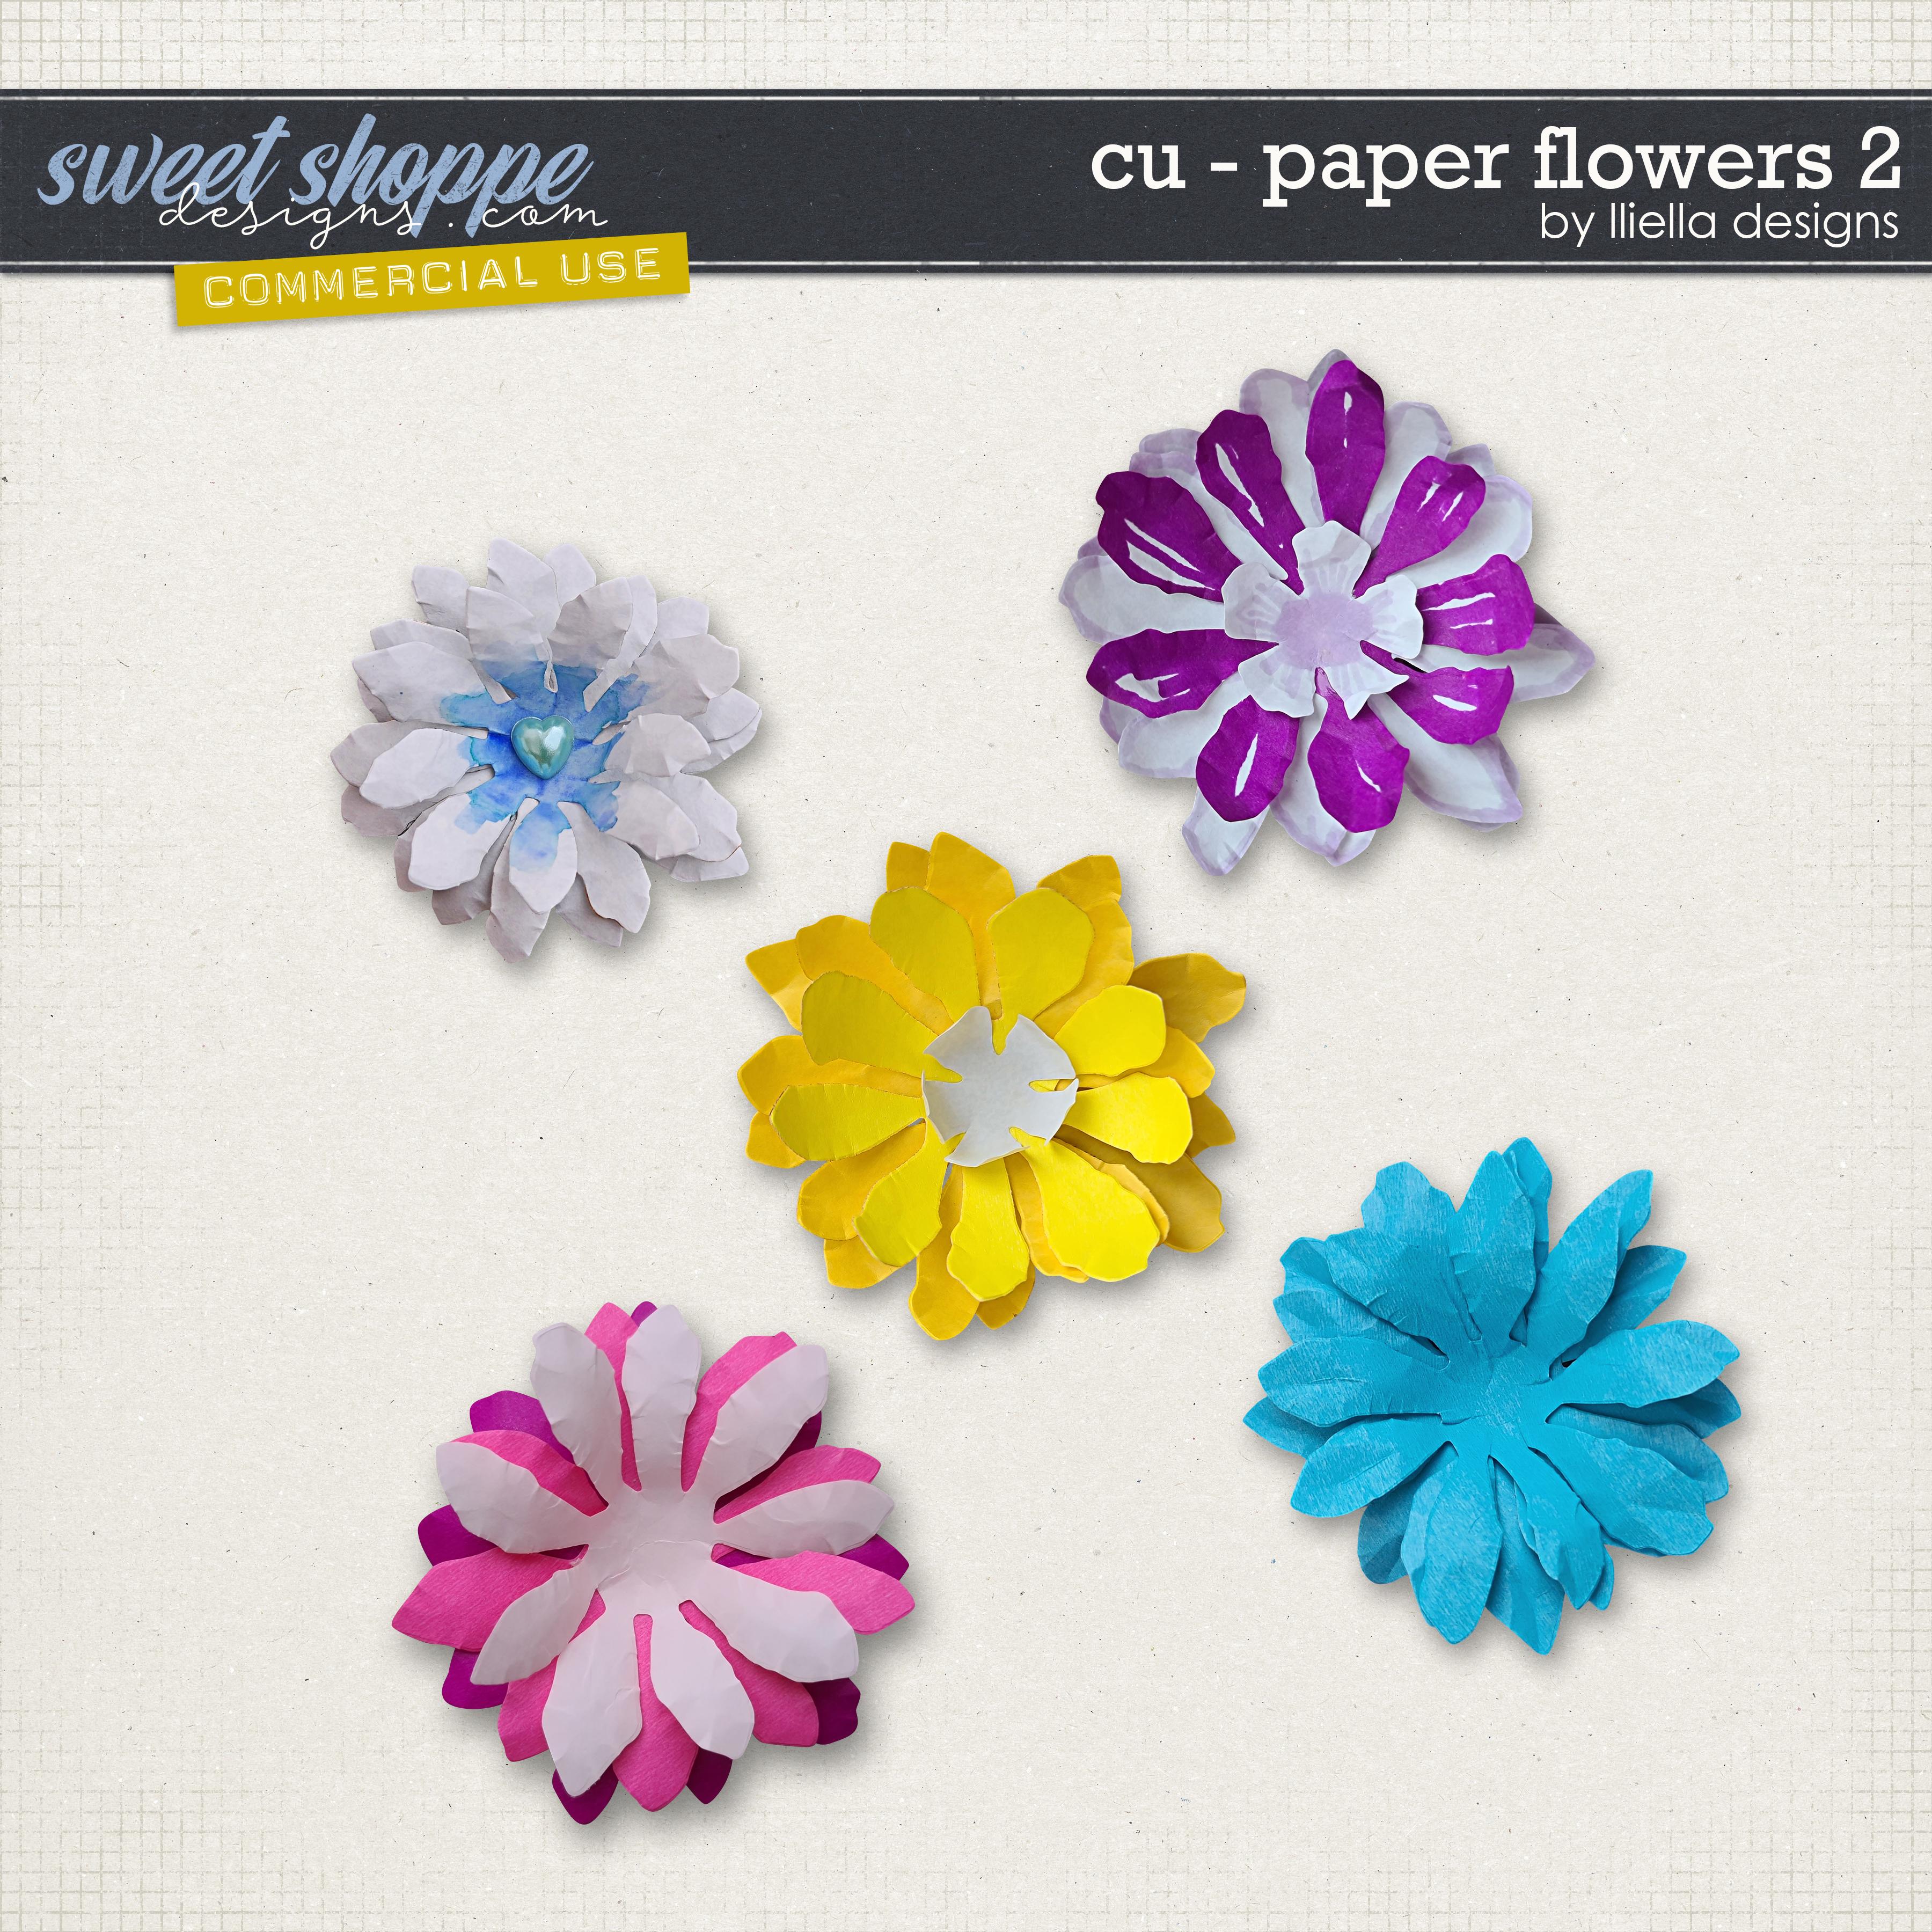 CU - Paper Flowers 2 by lliella designs